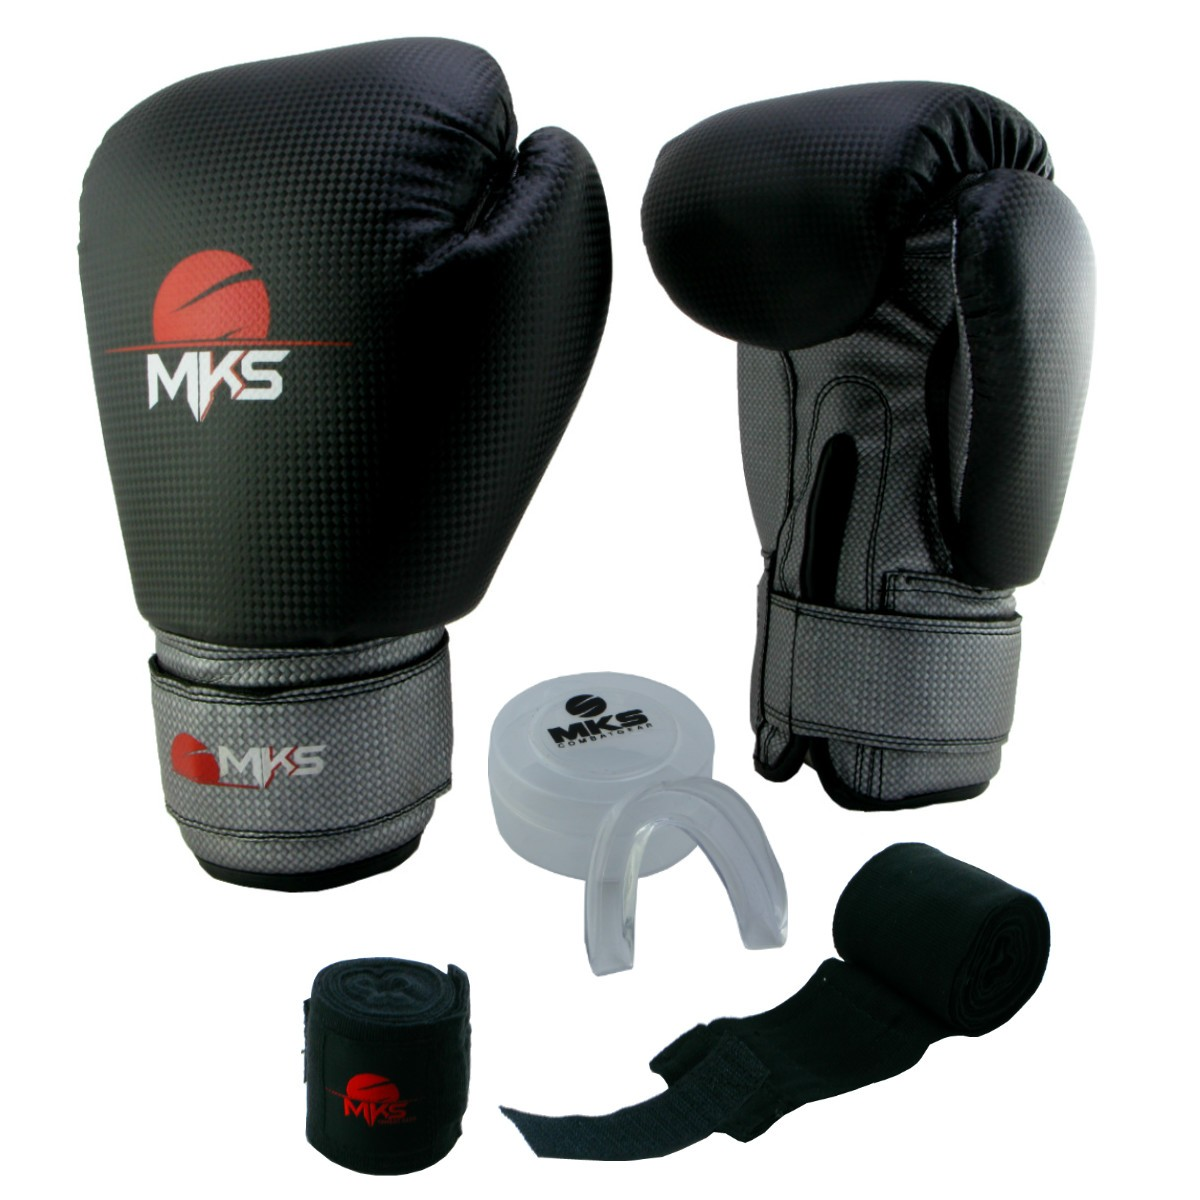 Luva de Boxe Prospect MKS Black & Silver 12 oz + Protetor Bucal + Bandagem